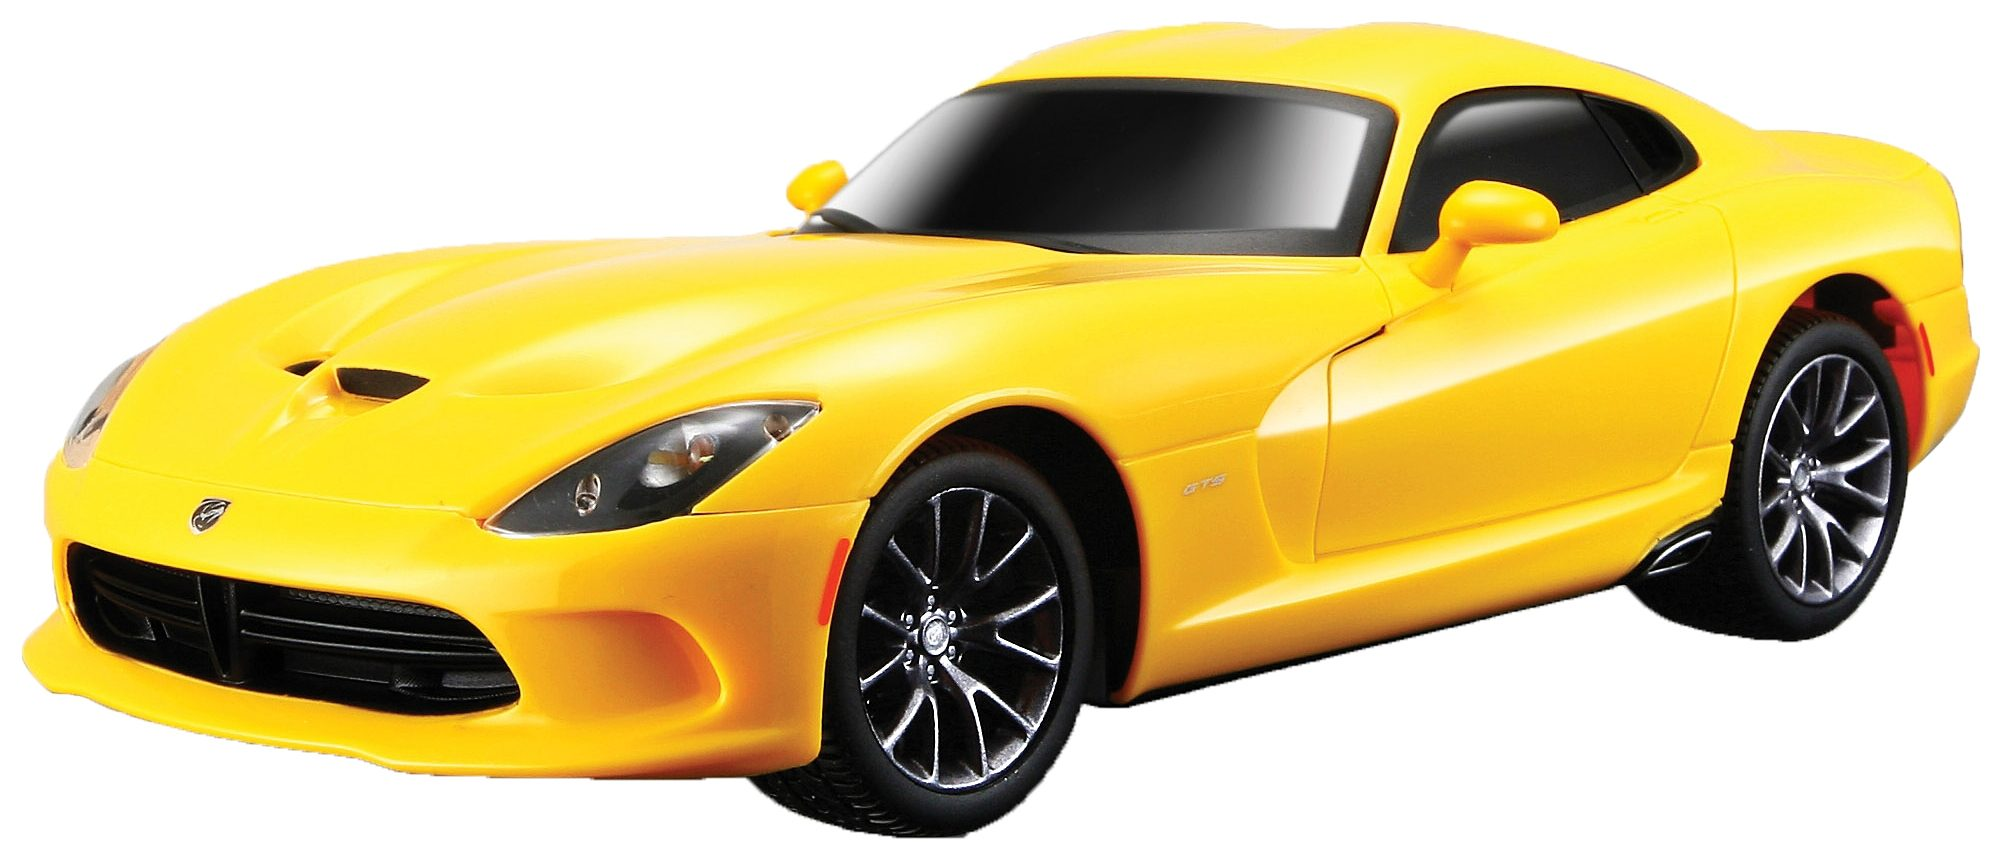 Maisto Tech® RC-Fahrzeug, »Dodge Viper GTS ´13 im originalgetreuen Design«